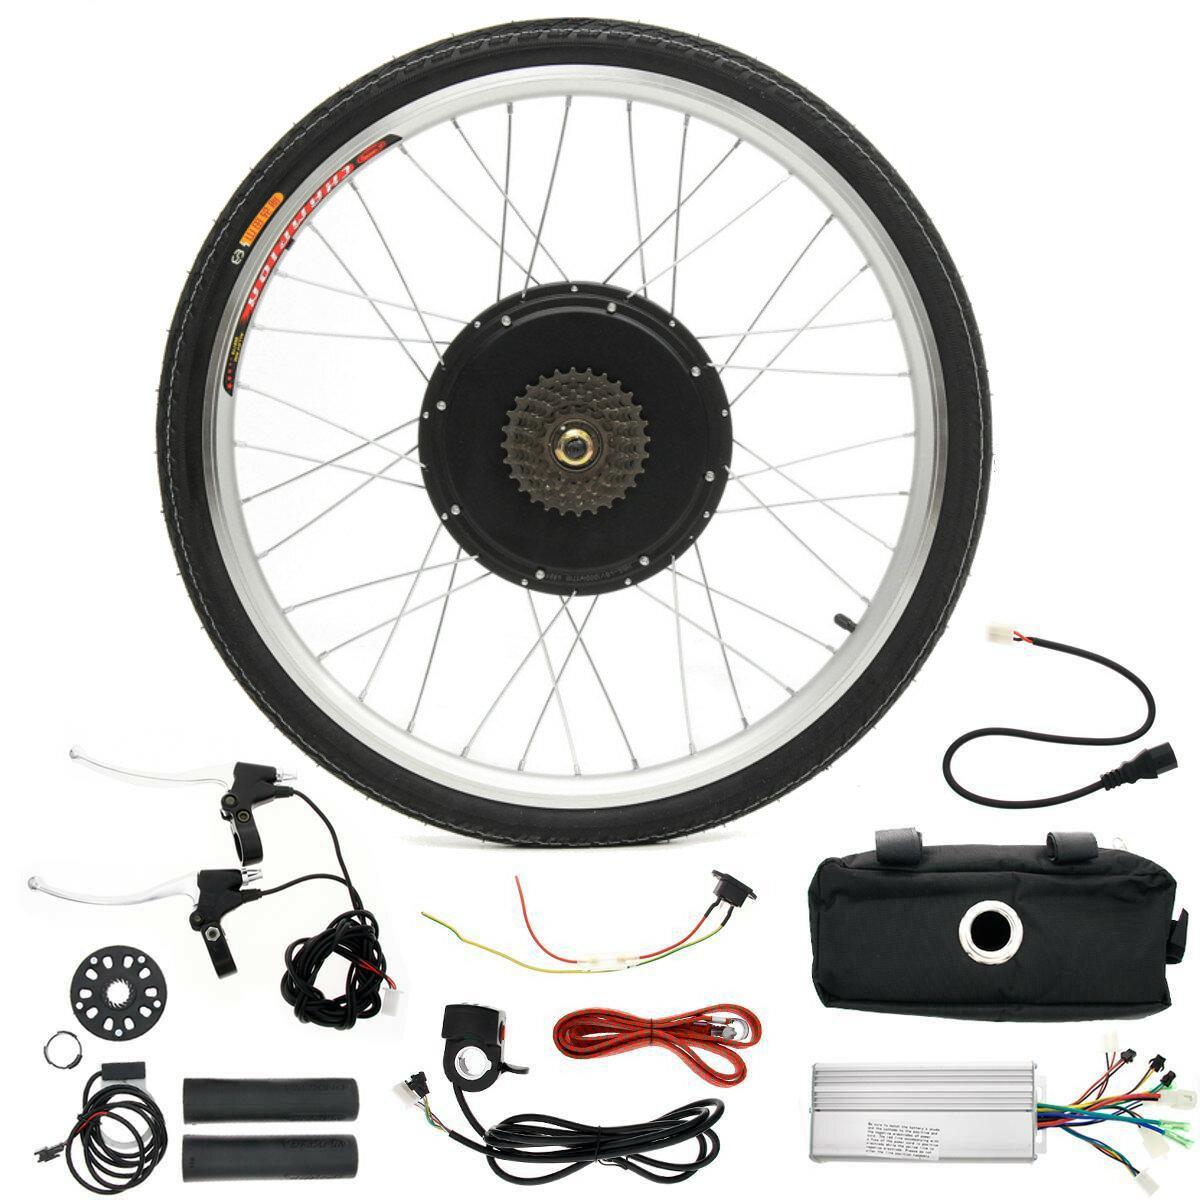 LCD + 48V 1000W 26inch High Speed Scooter Electric Bicycle E-bike Hub Мотор Преобразование Набор